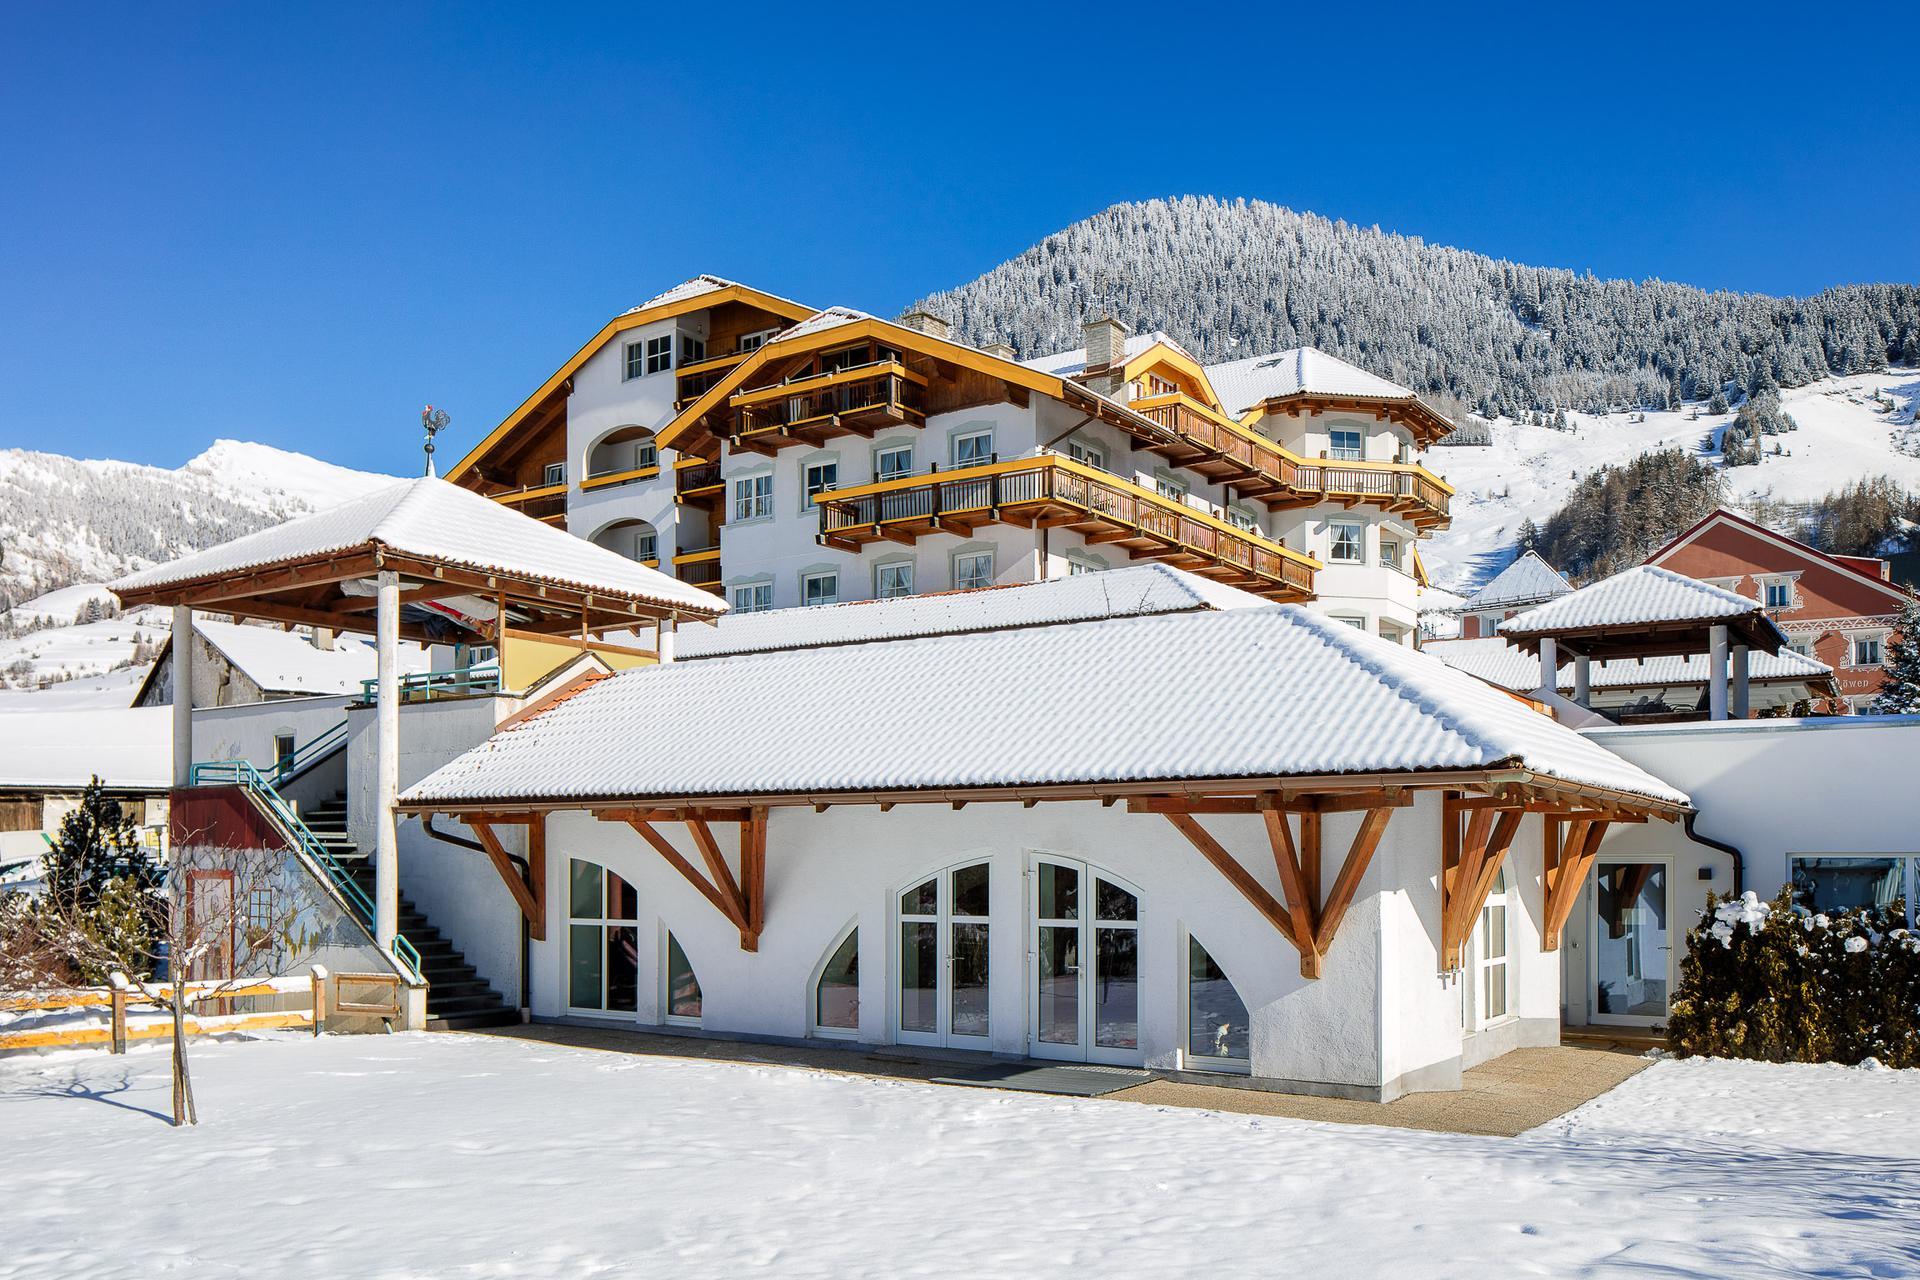 4 Sterne Hotel Nauders Schoner Urlaub Im Hotel Post In Nauders